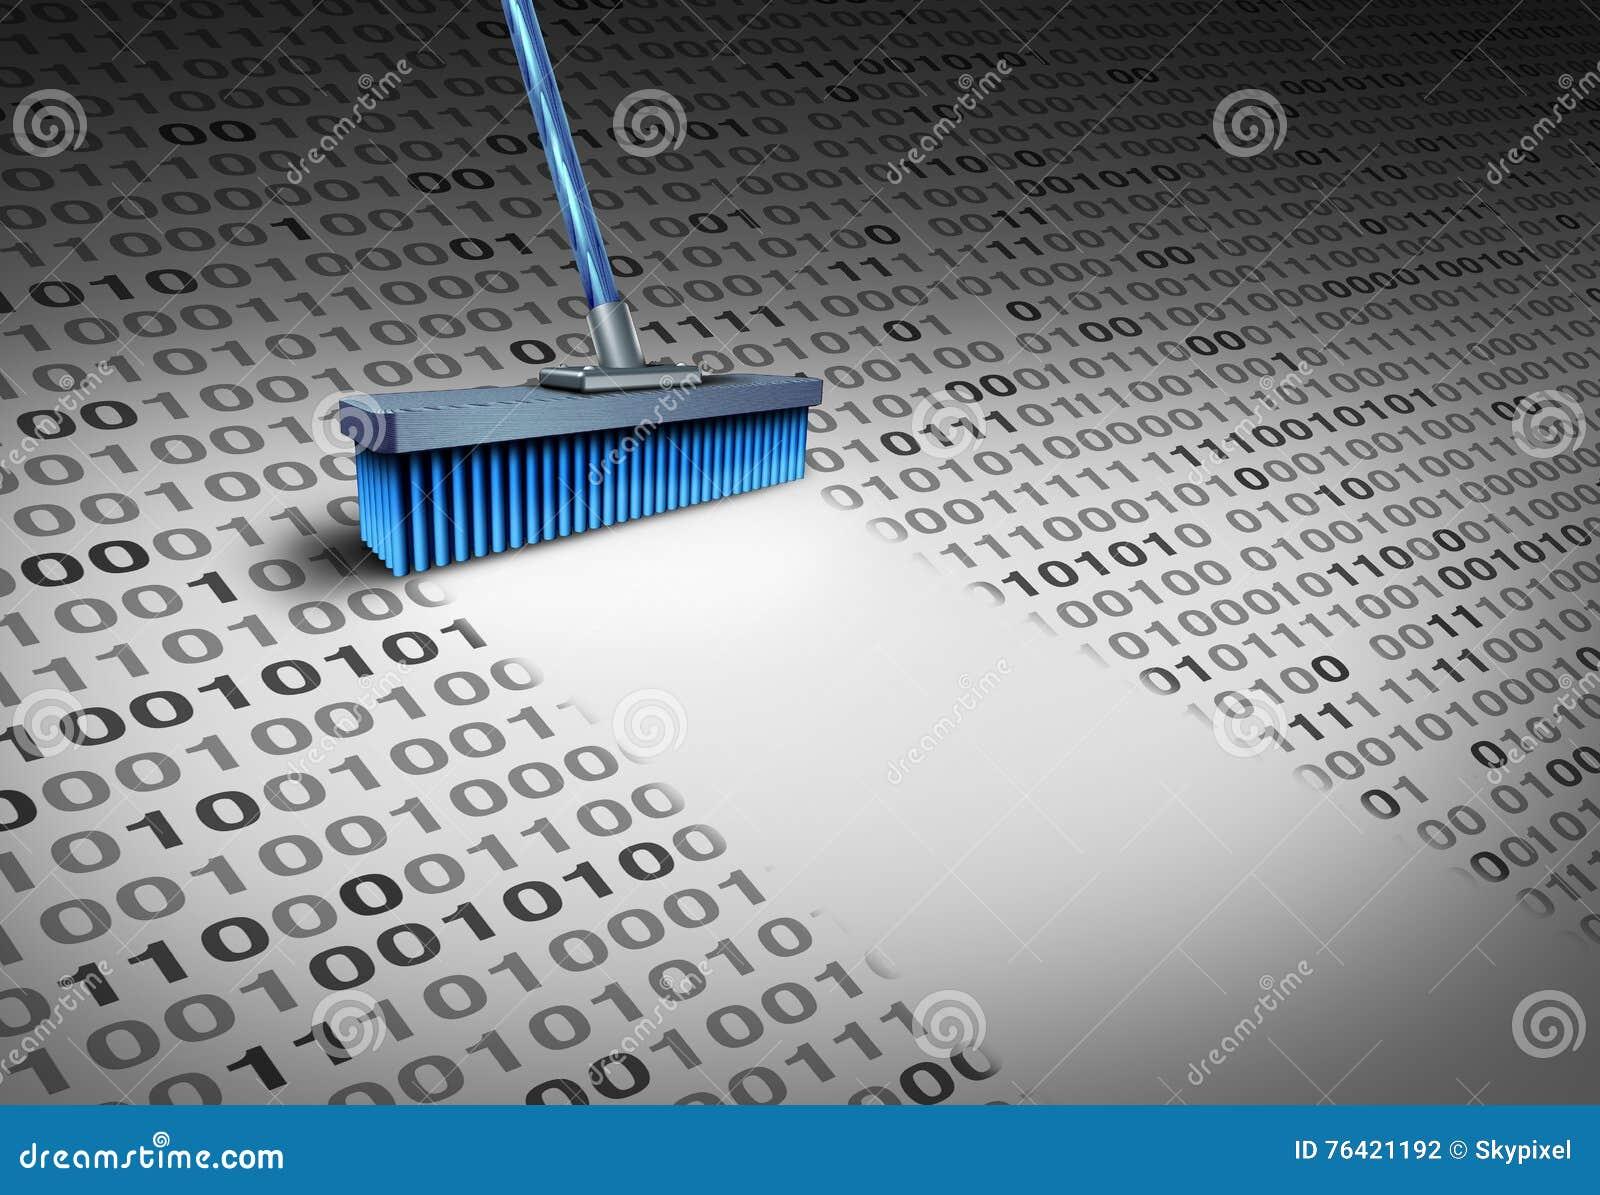 Deleting Data stock illustration. Illustration of broom ...